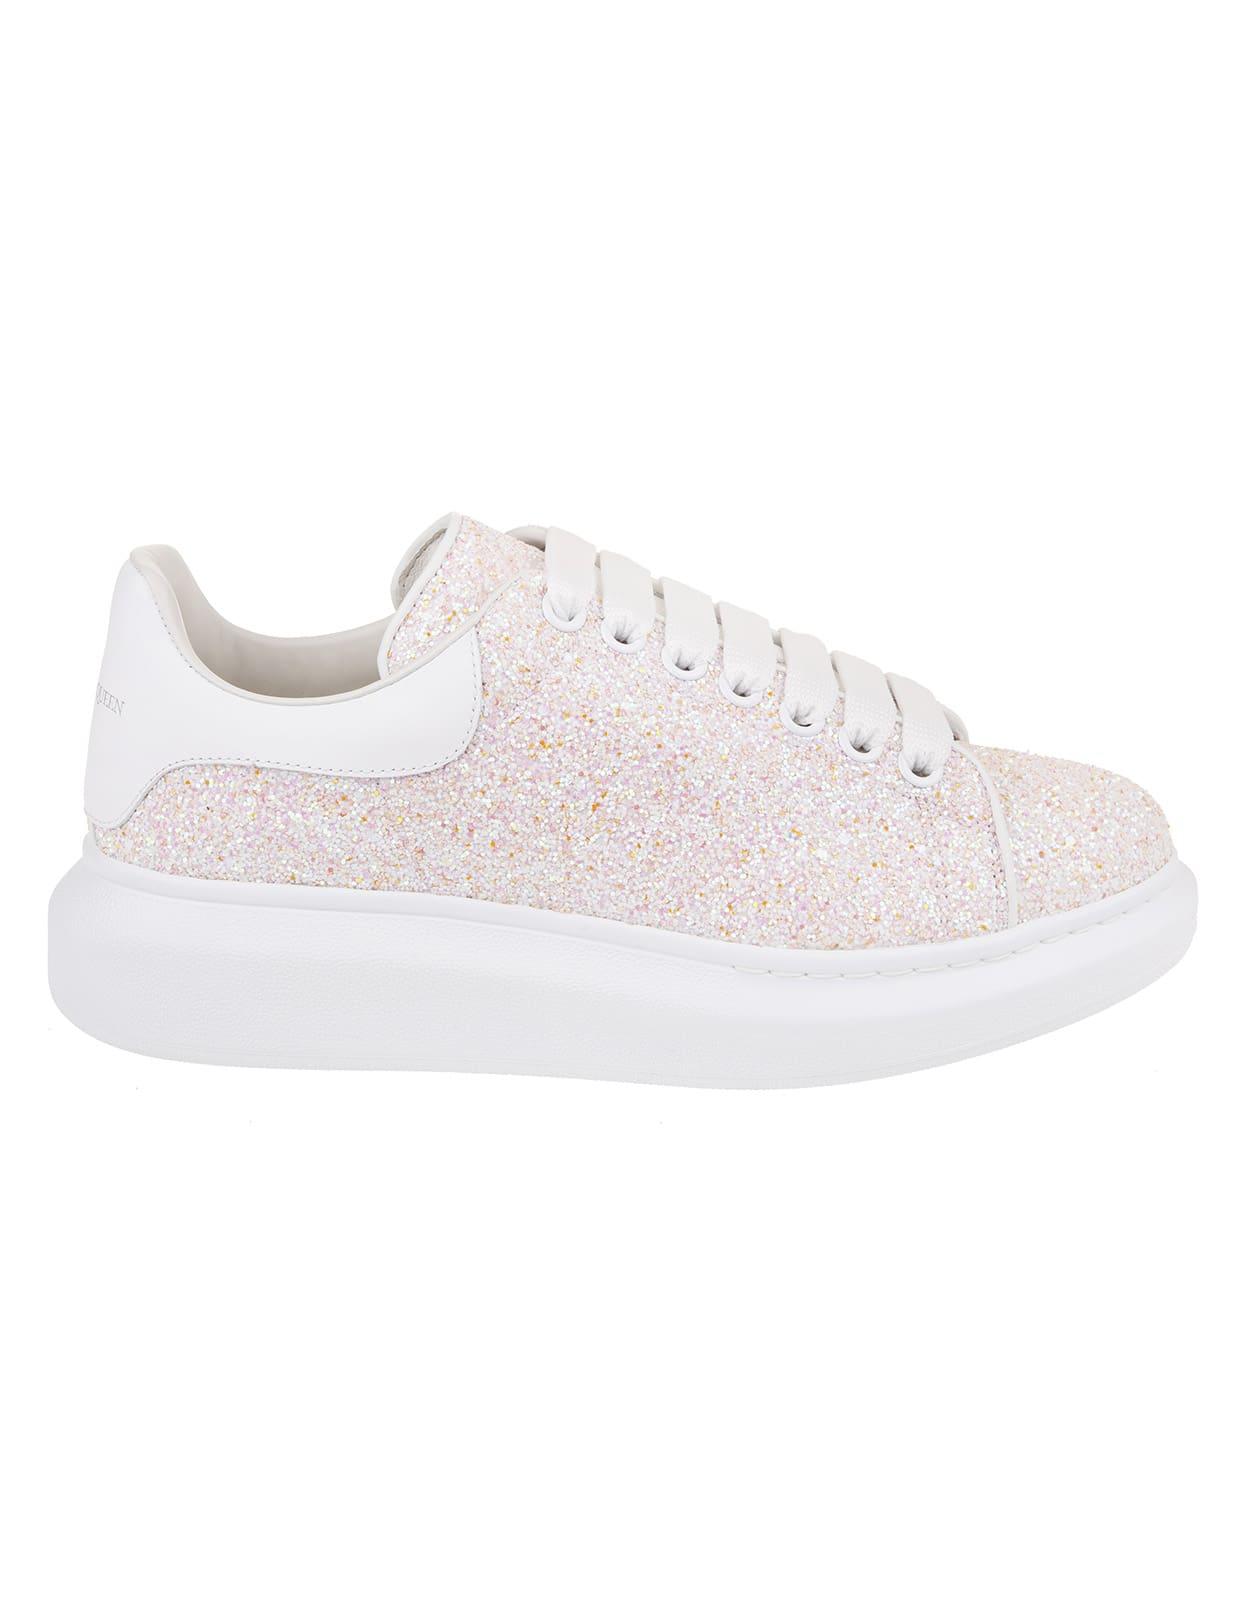 Alexander McQueen Woman Light Pink Glitter Oversize Sneakers